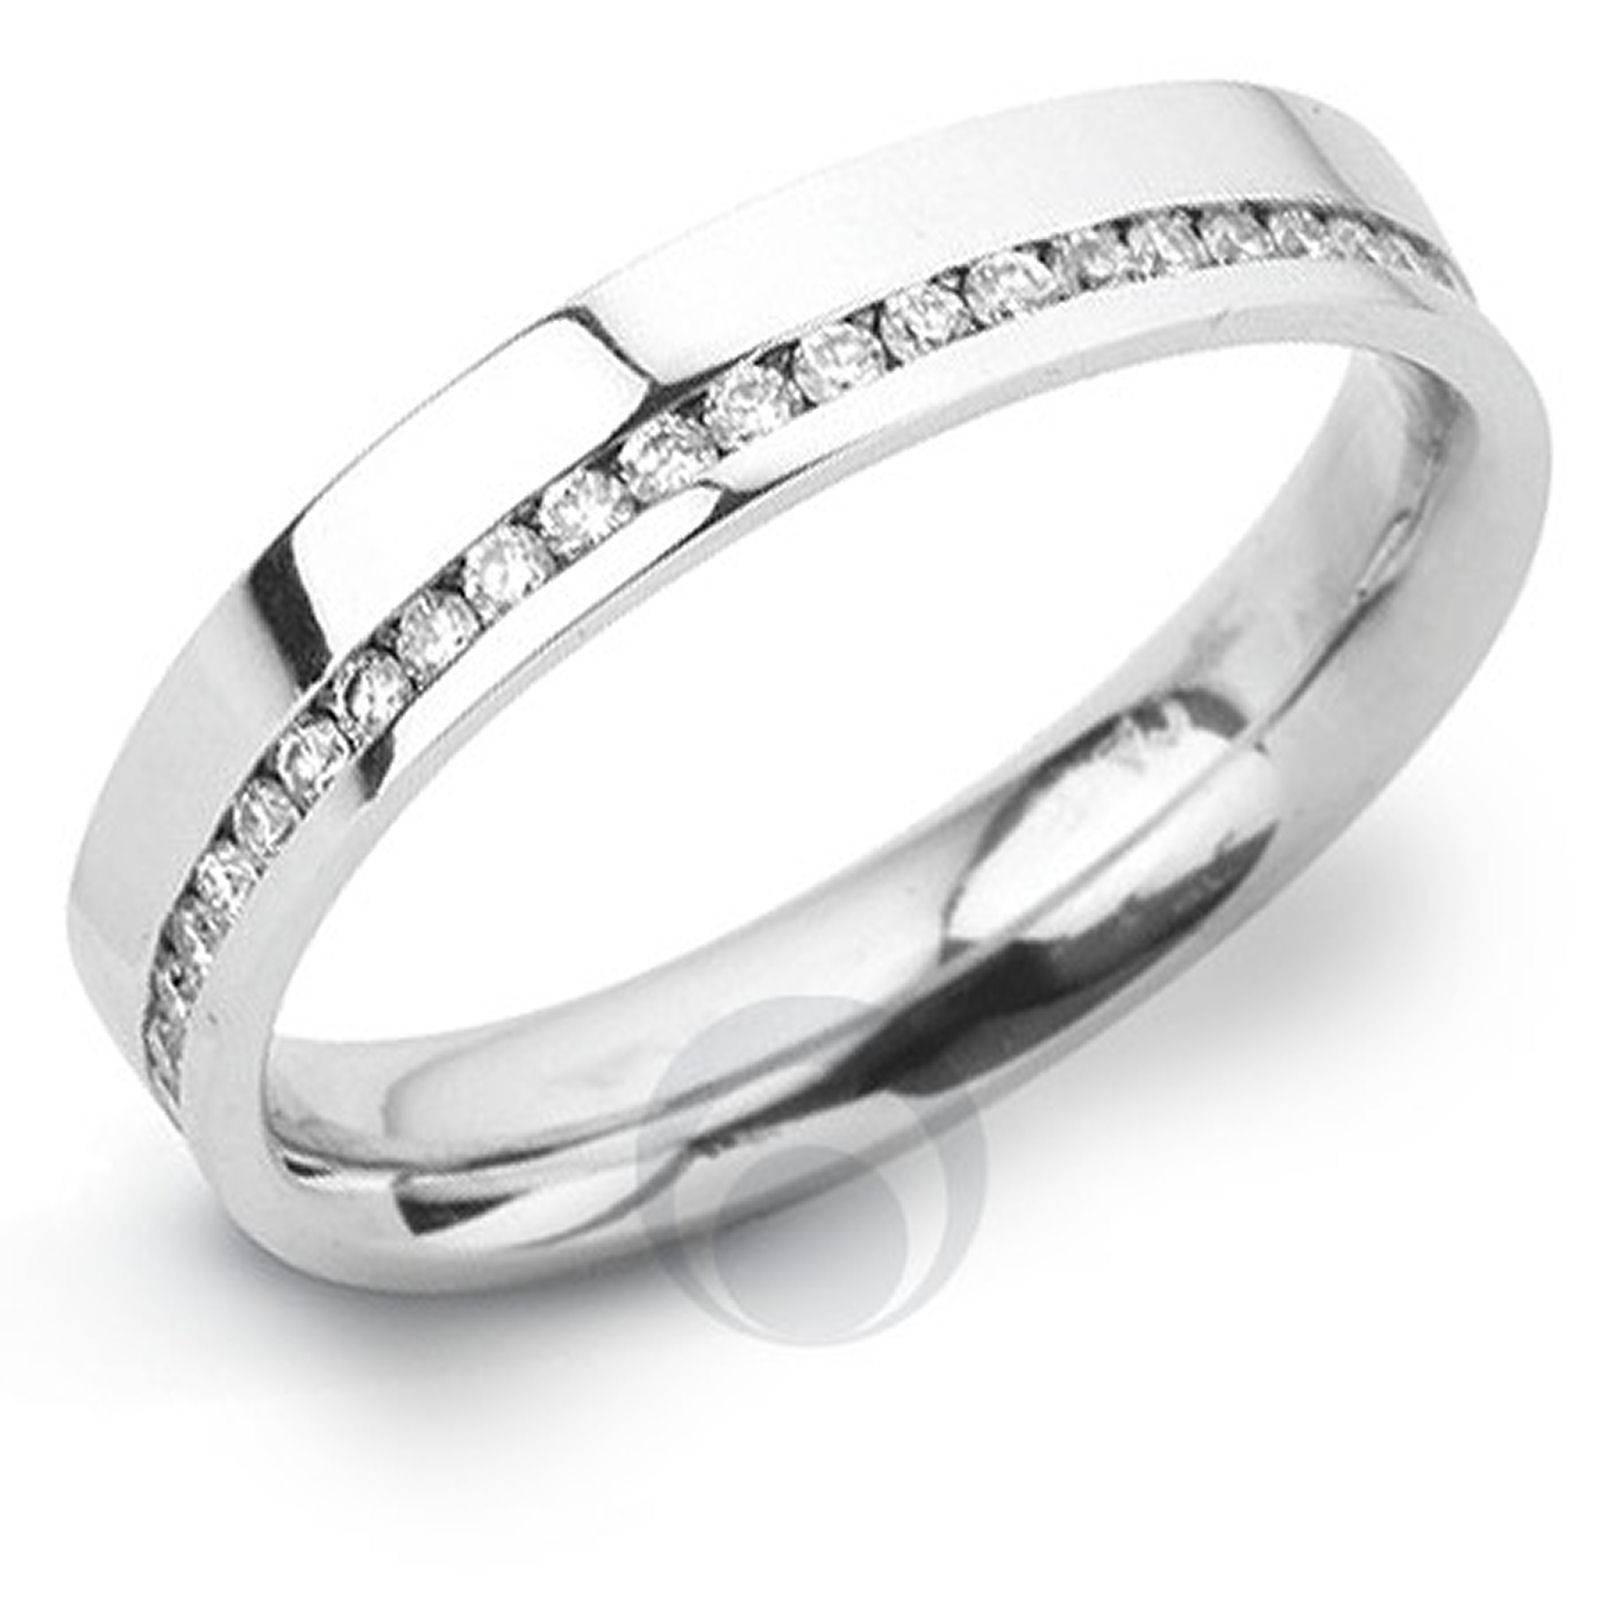 Channel Diamond Platinum Wedding Ring Wedding Dress From The In Diamond Platinum Wedding Rings (View 10 of 15)